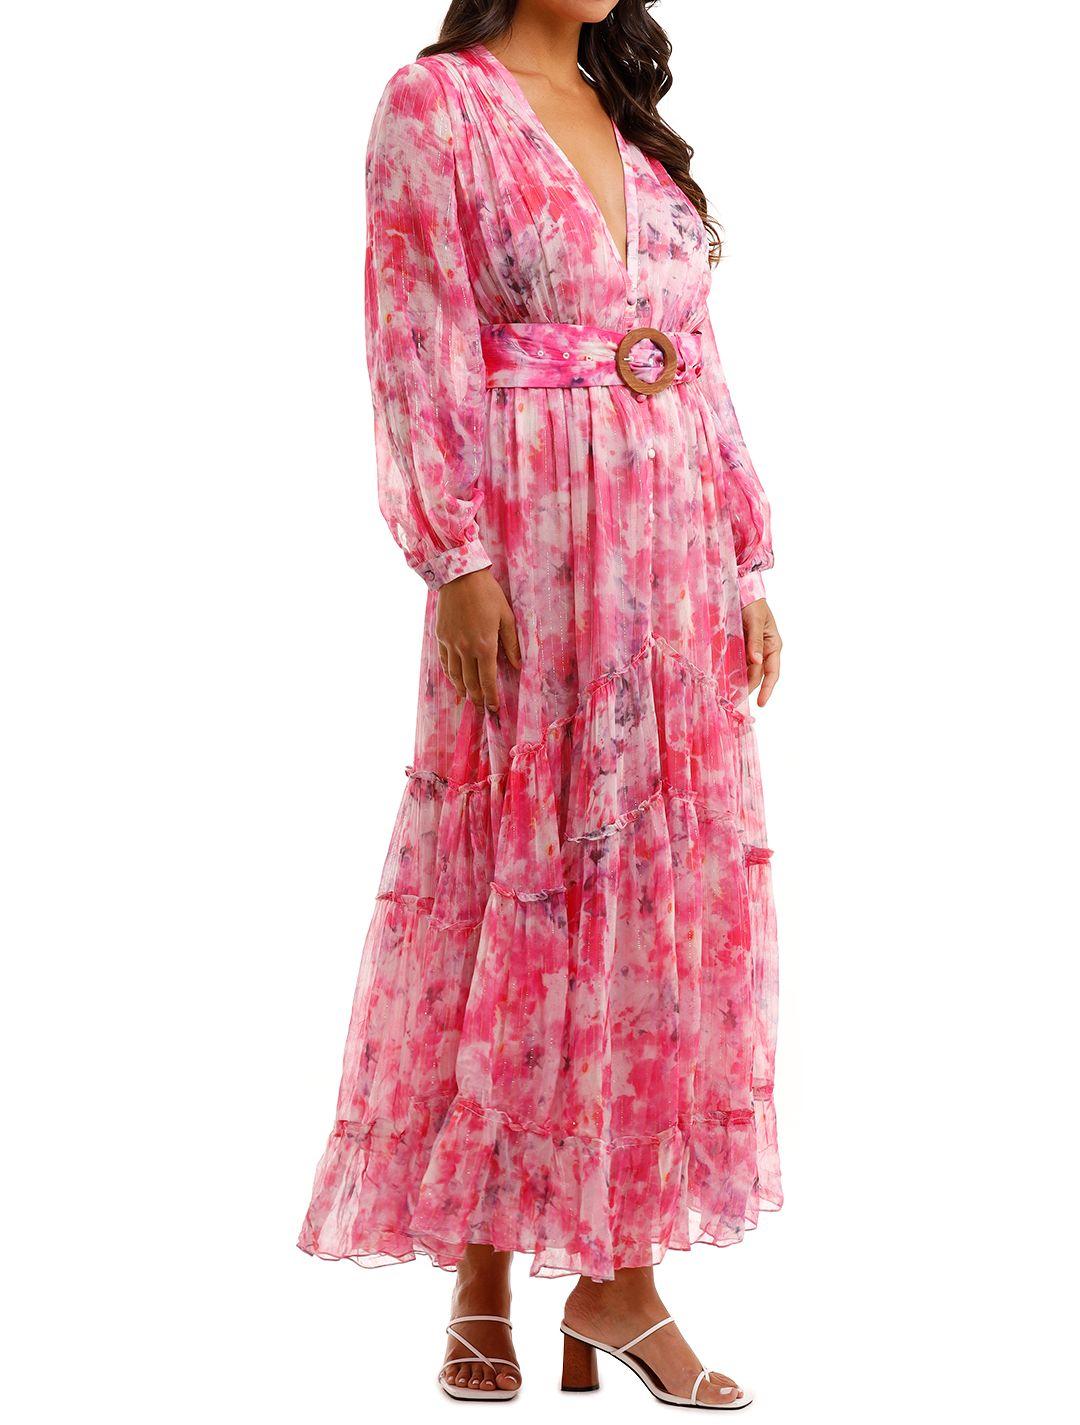 Rococo Sand Hikari Dress Pink floral